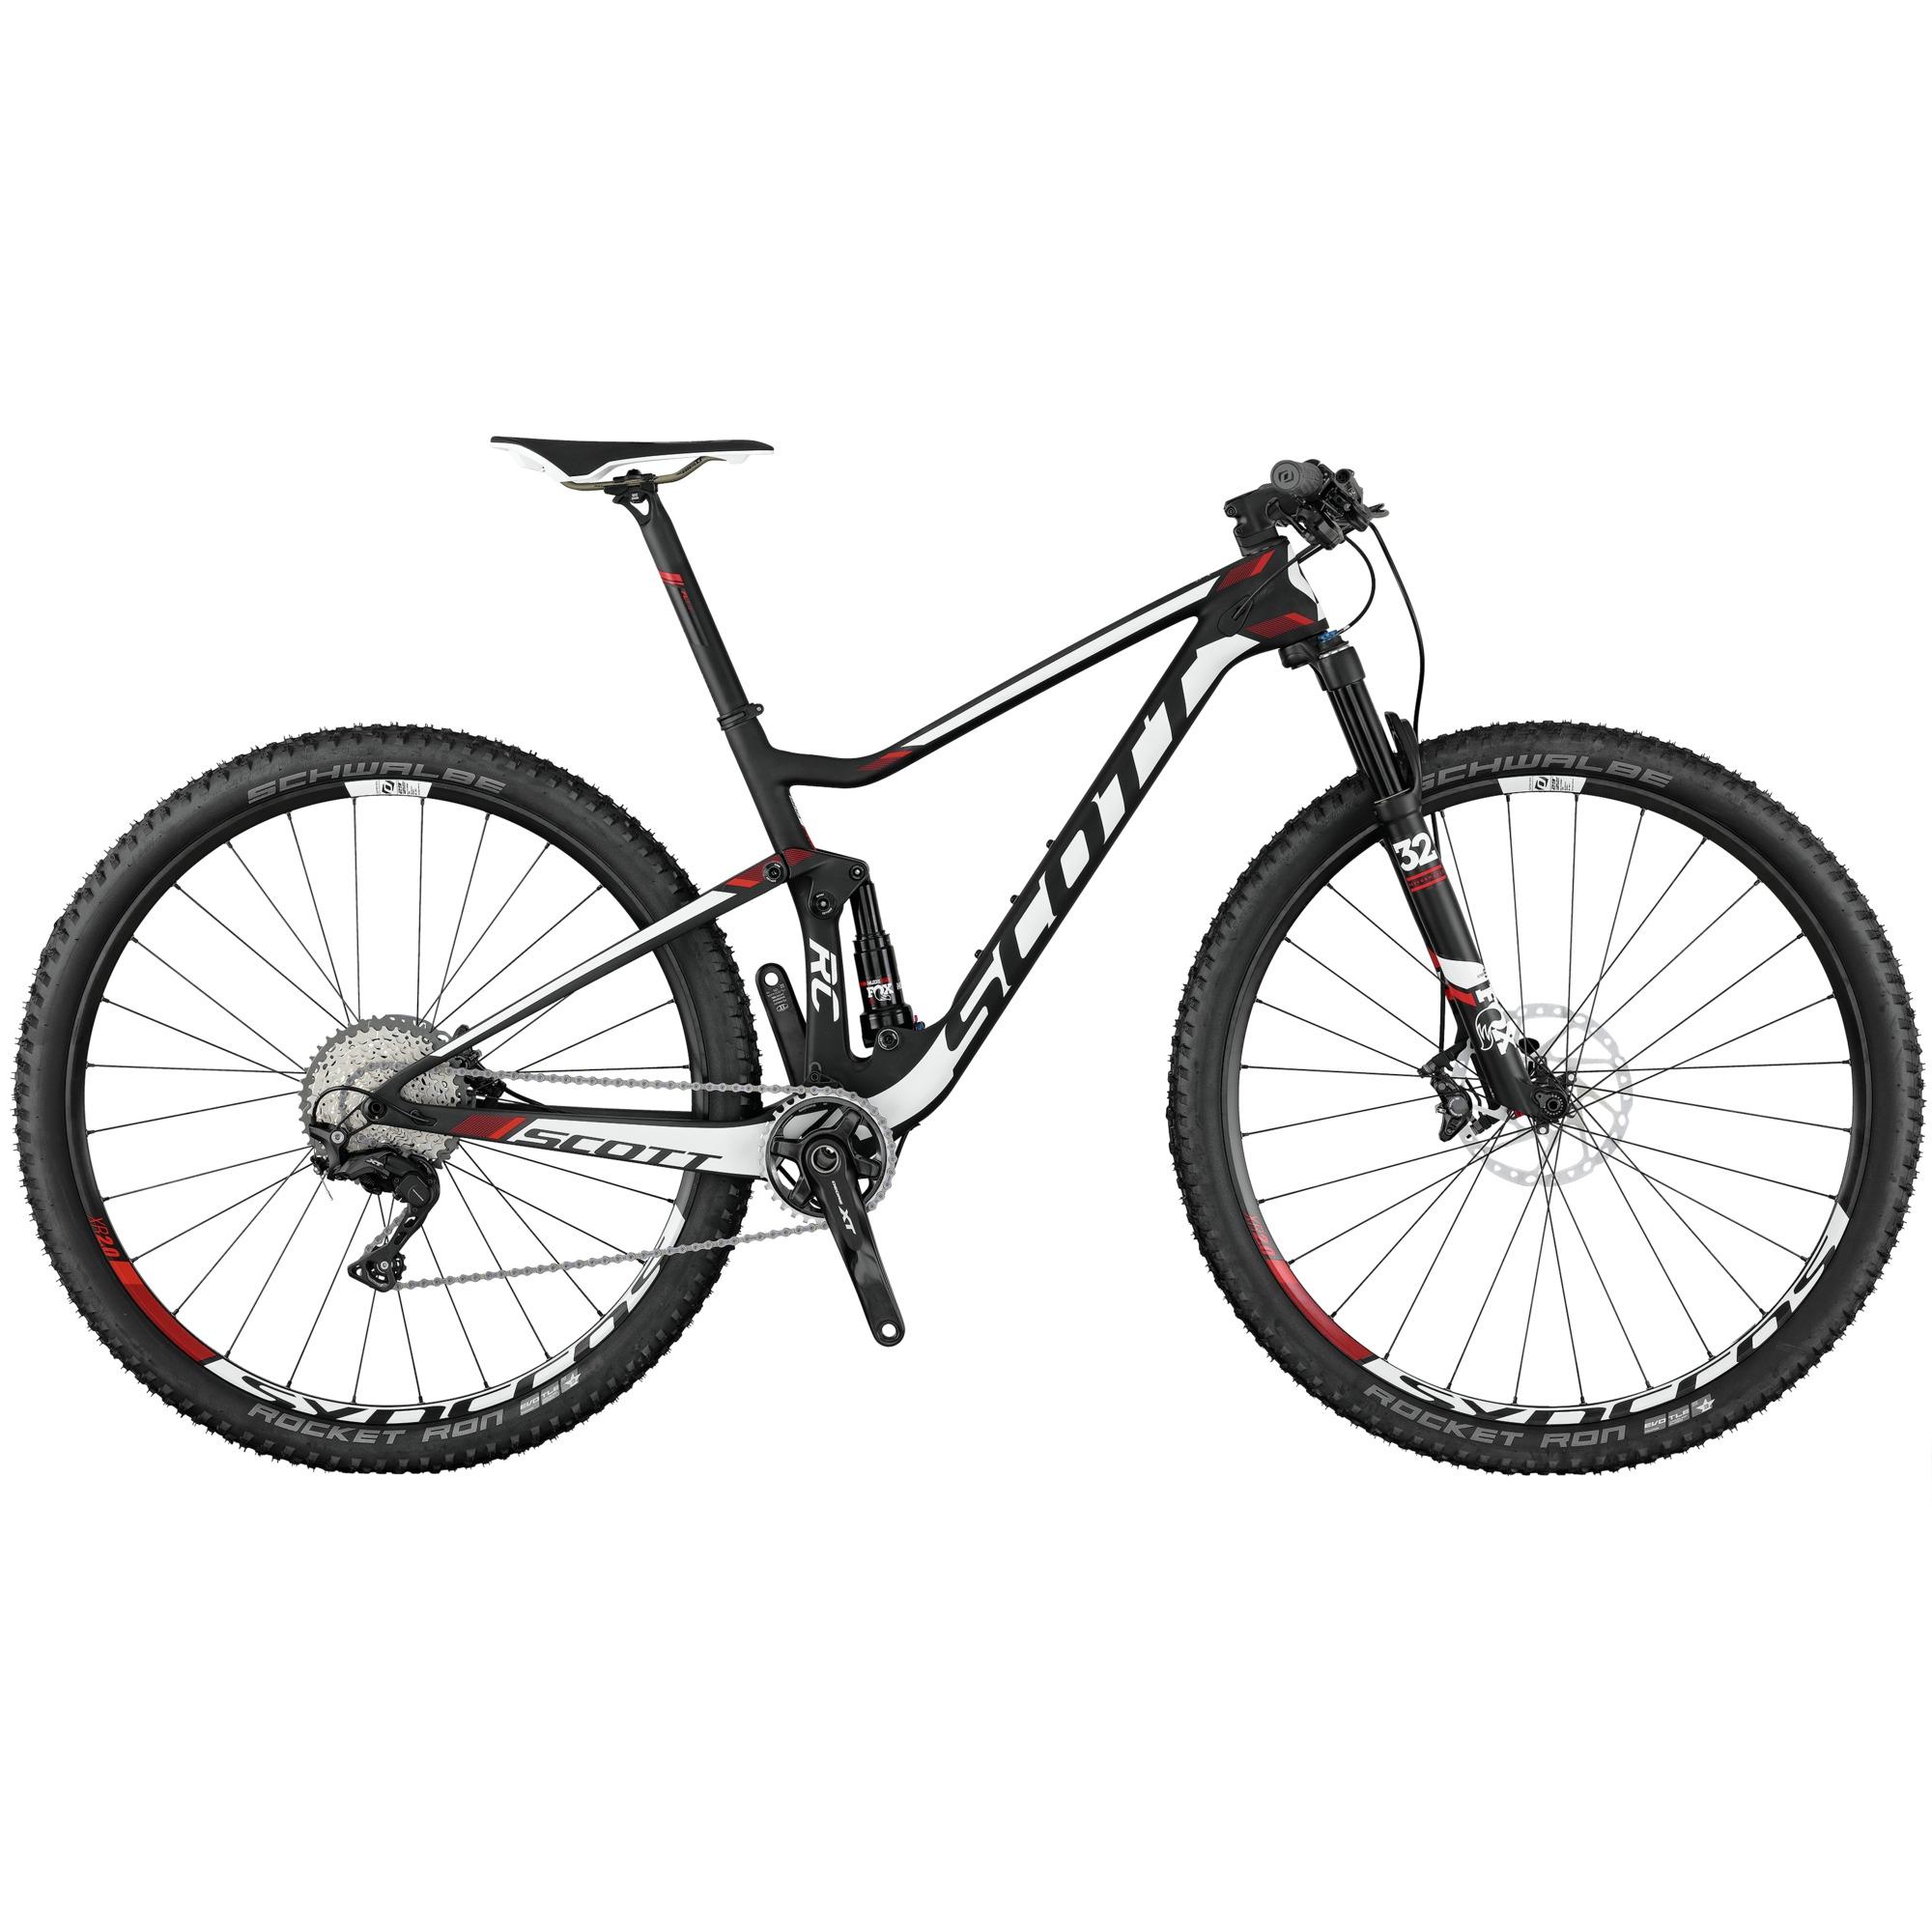 2017 Scott Spark RC 700 Ultimate Carbon Mountain Bike